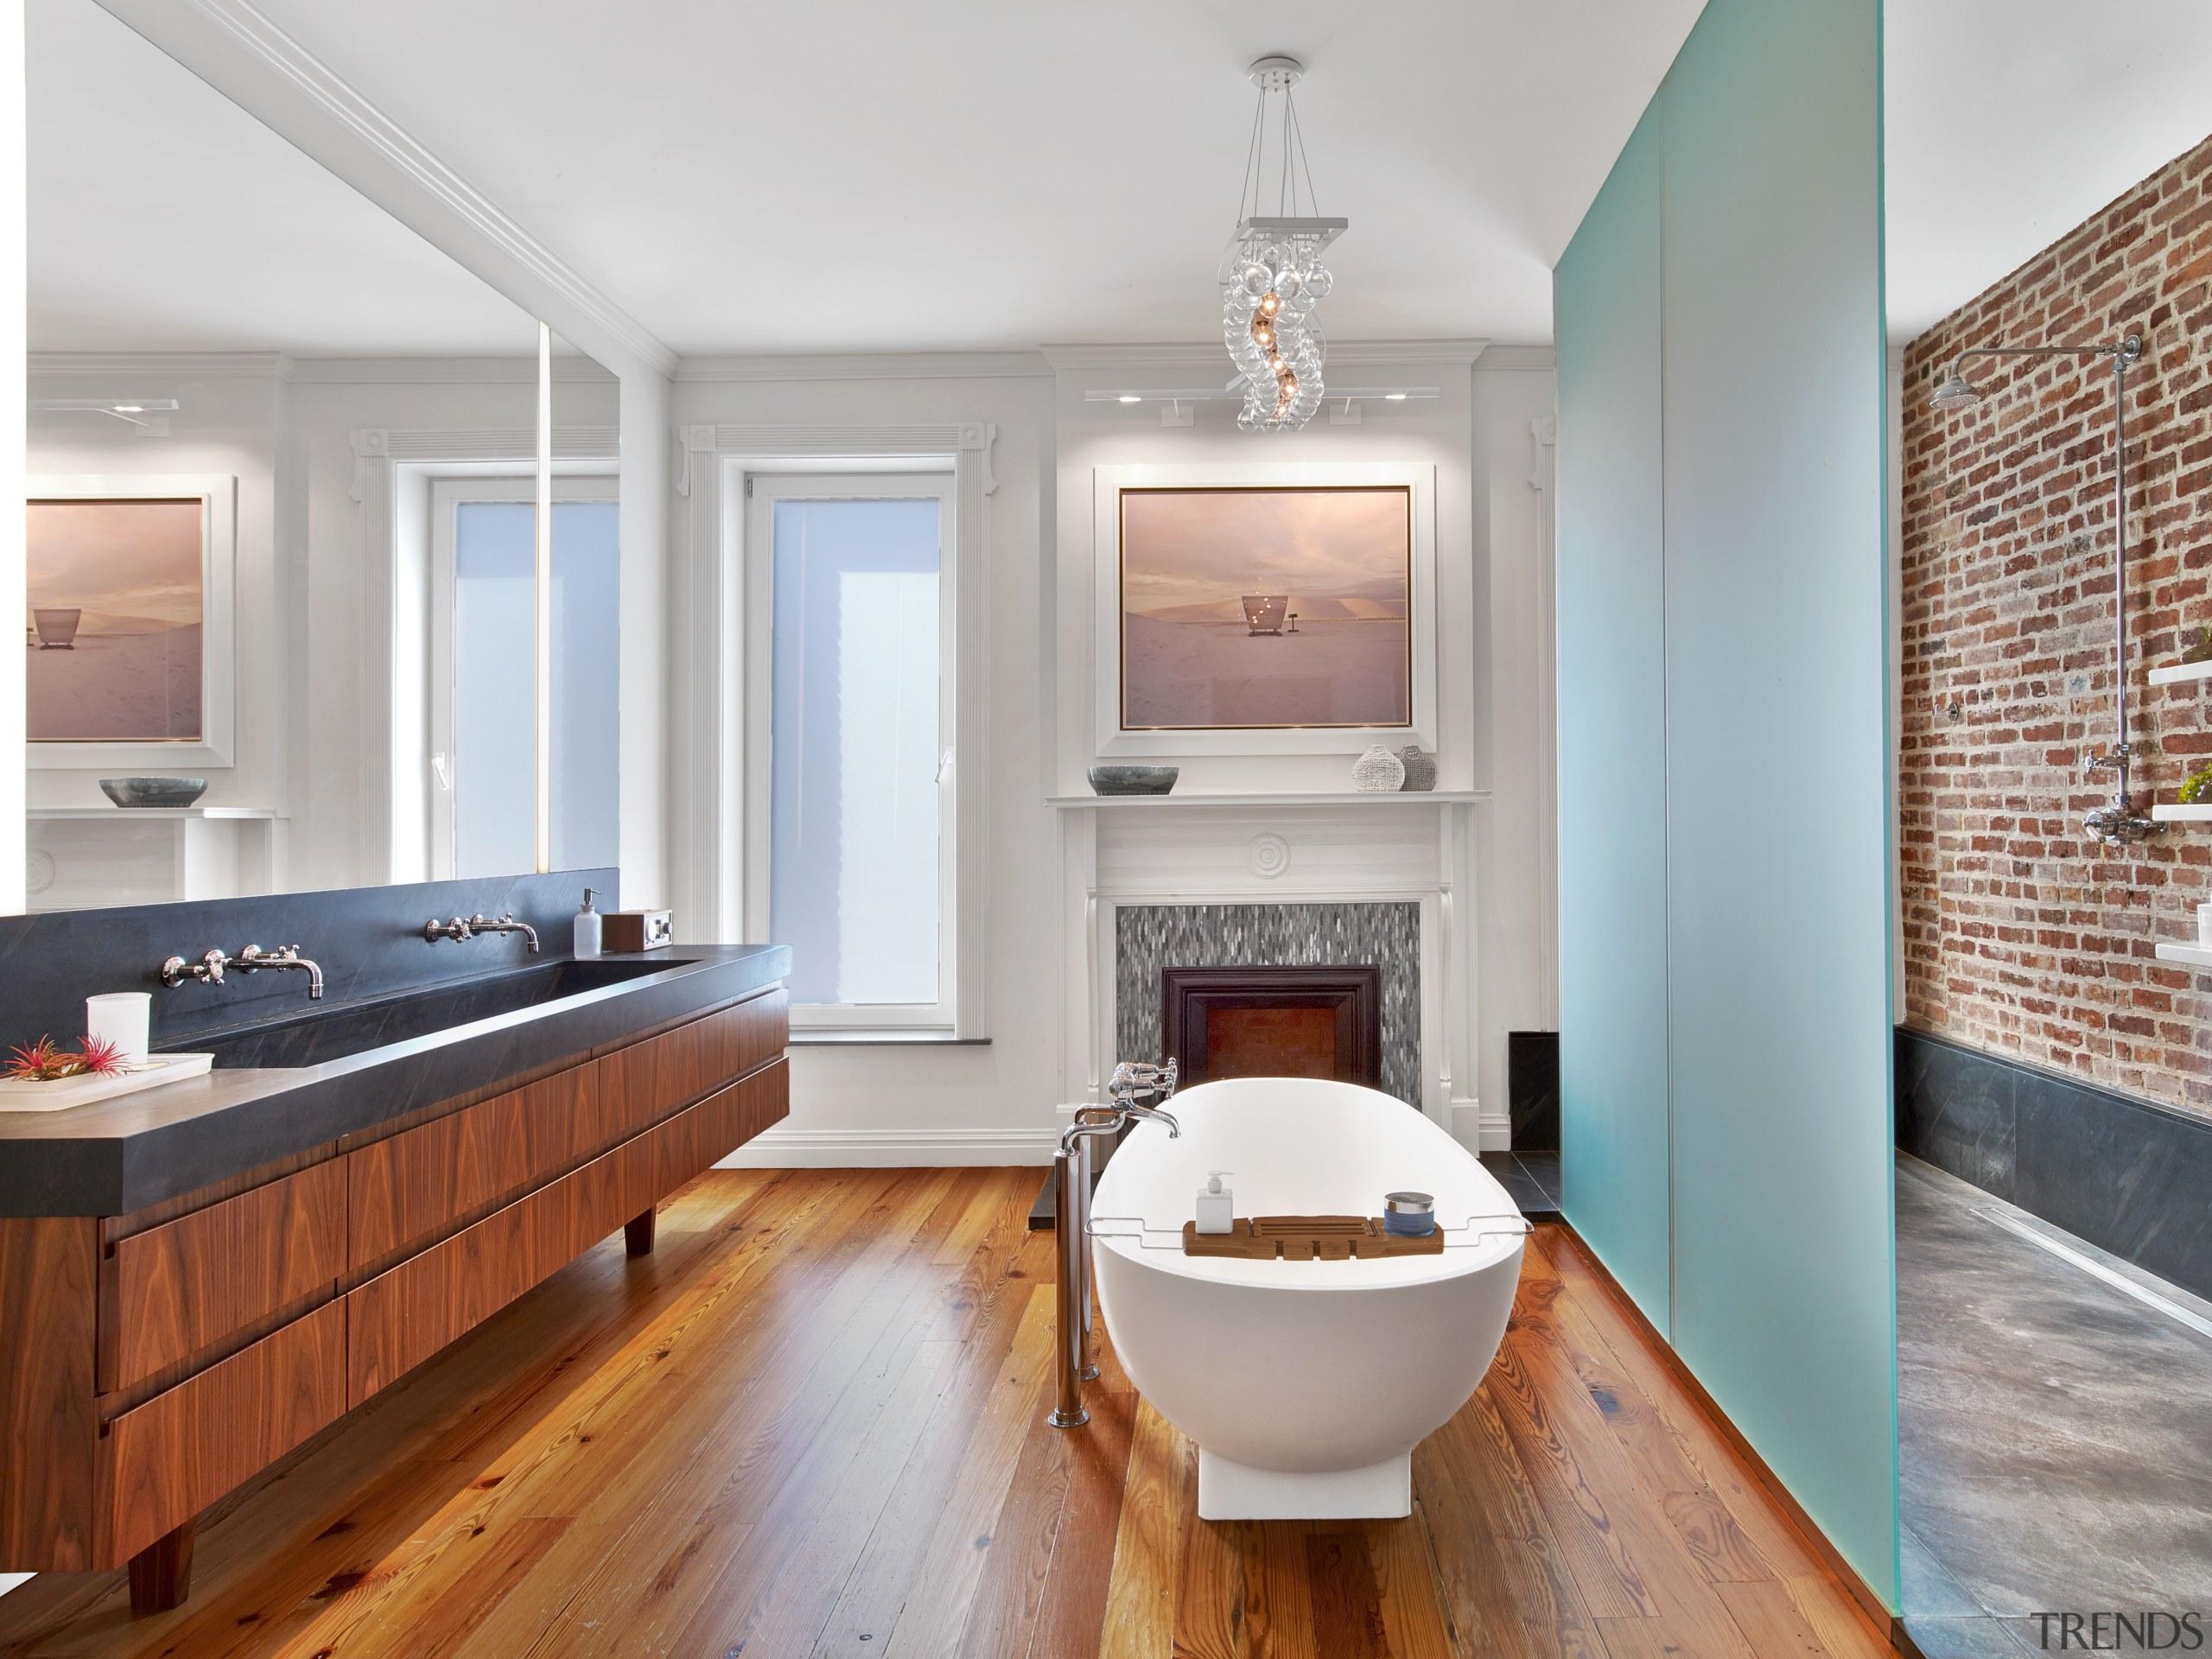 This new master bathroom in a gracious New bathroom, countertop, floor, flooring, hardwood, home, interior design, kitchen, real estate, room, sink, wood flooring, gray